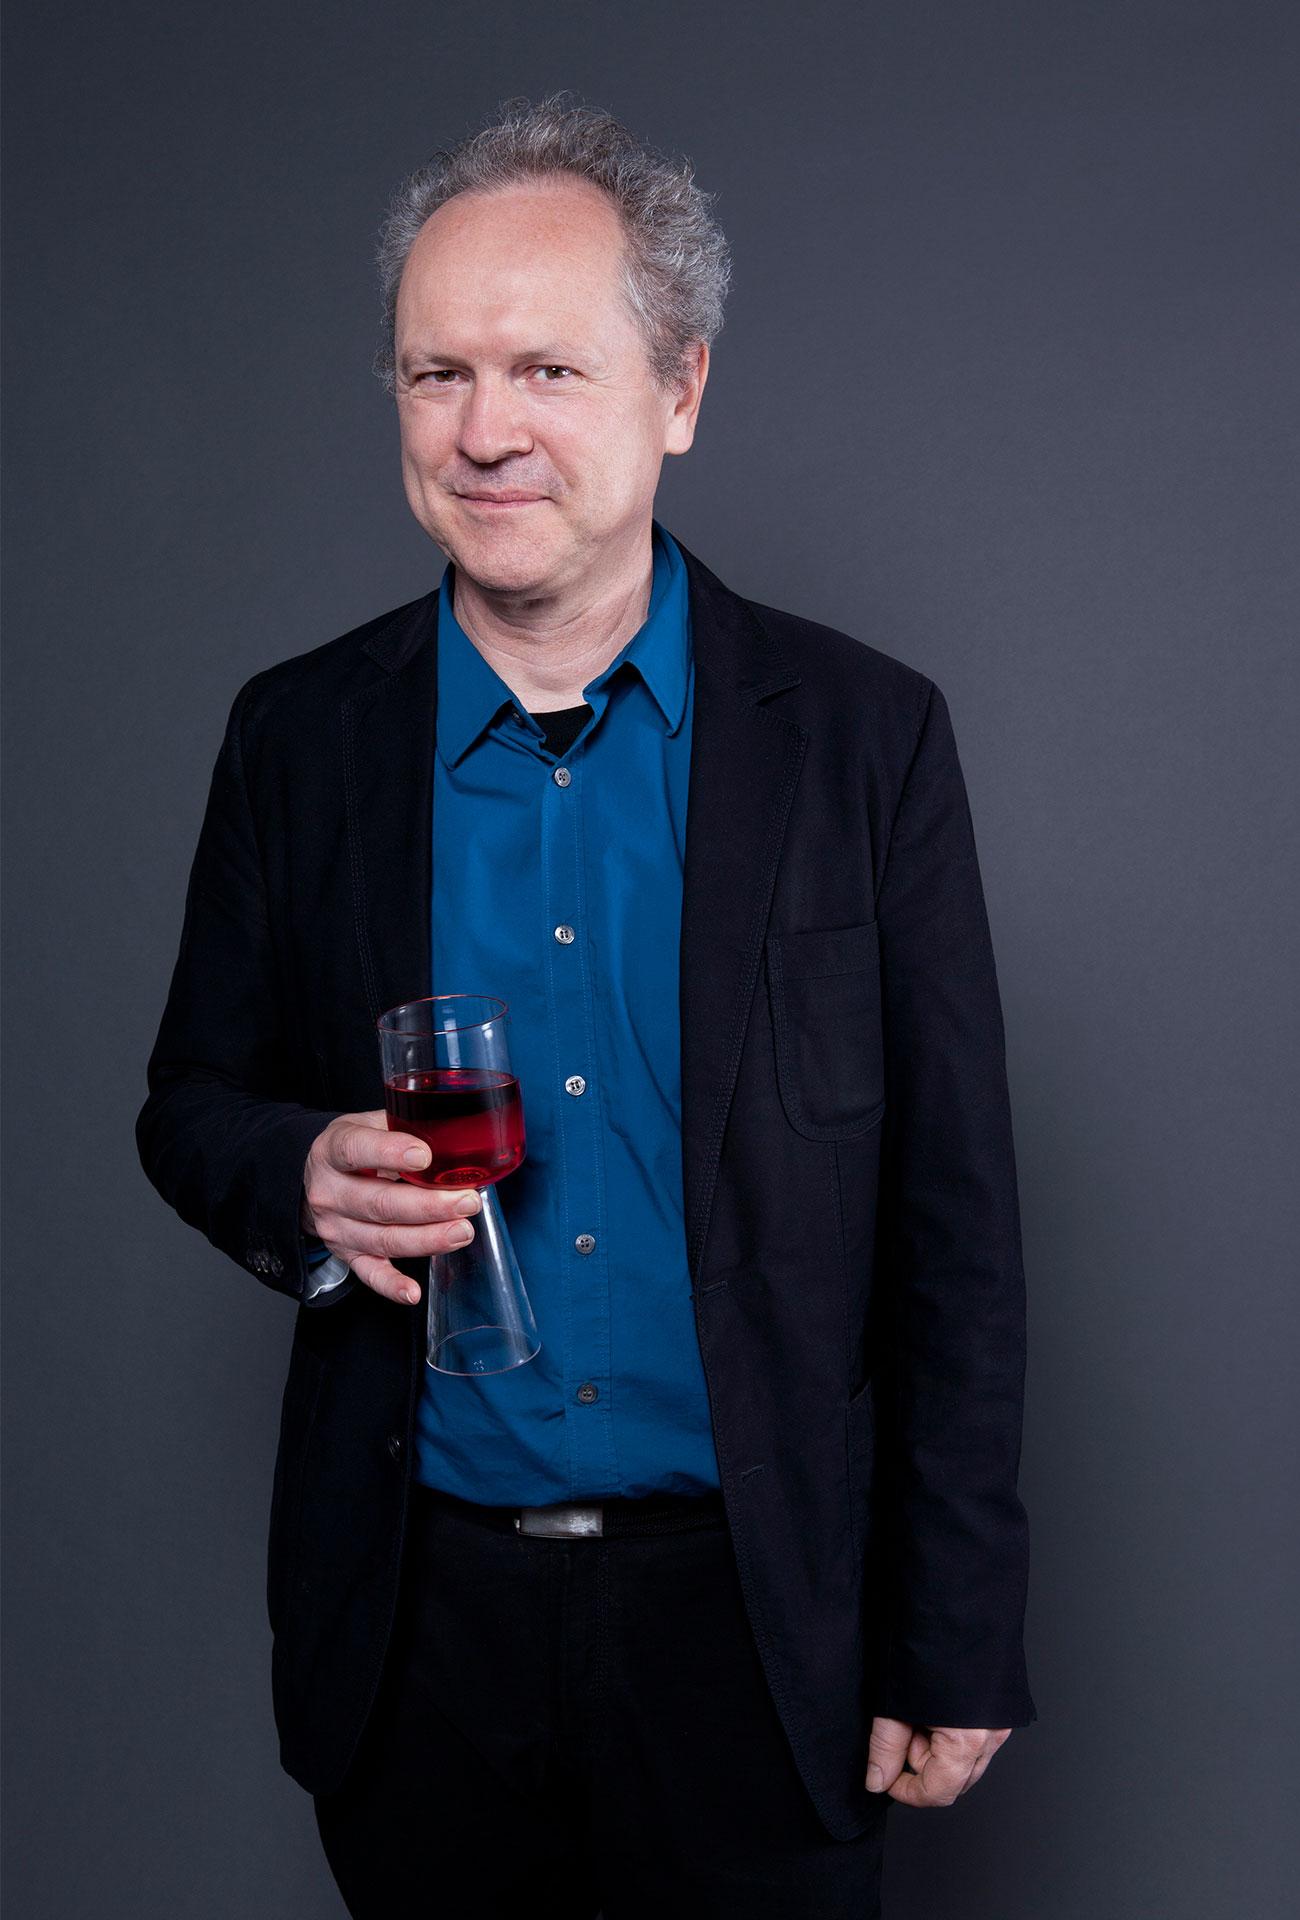 Cornelius Réer mit Weinglas